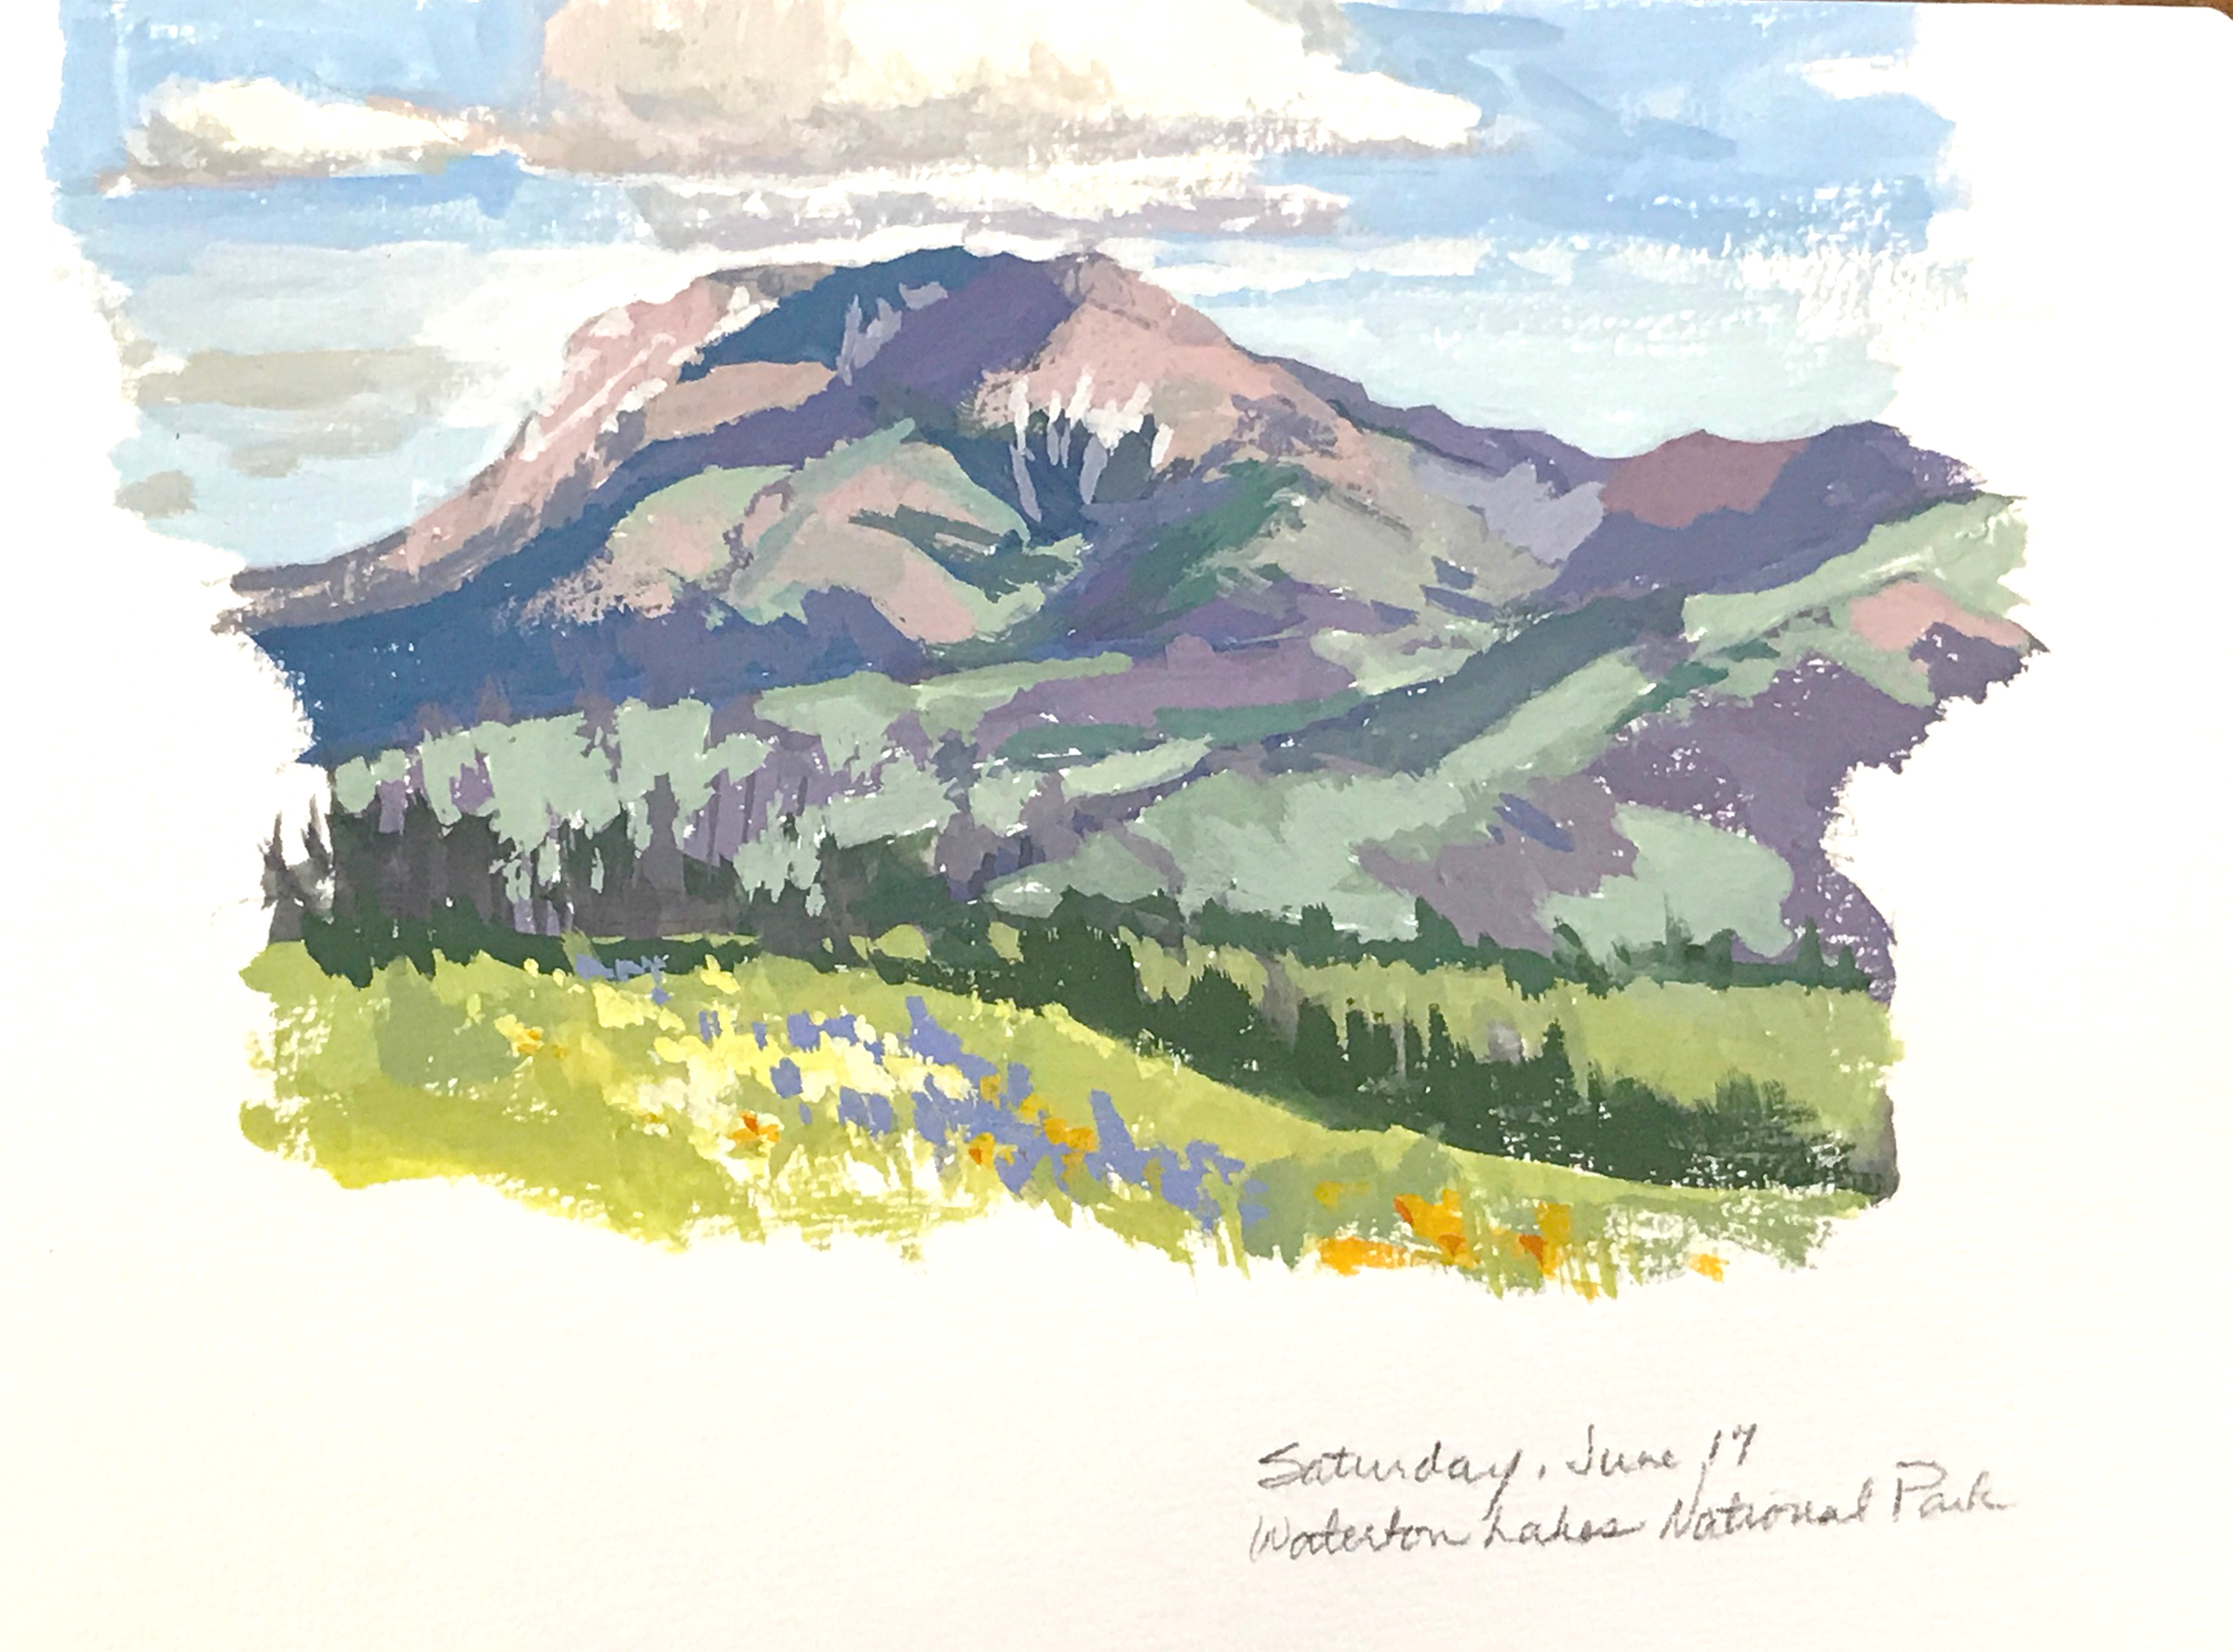 Gouache sketch from Waterton Lakes National Park, Alberta